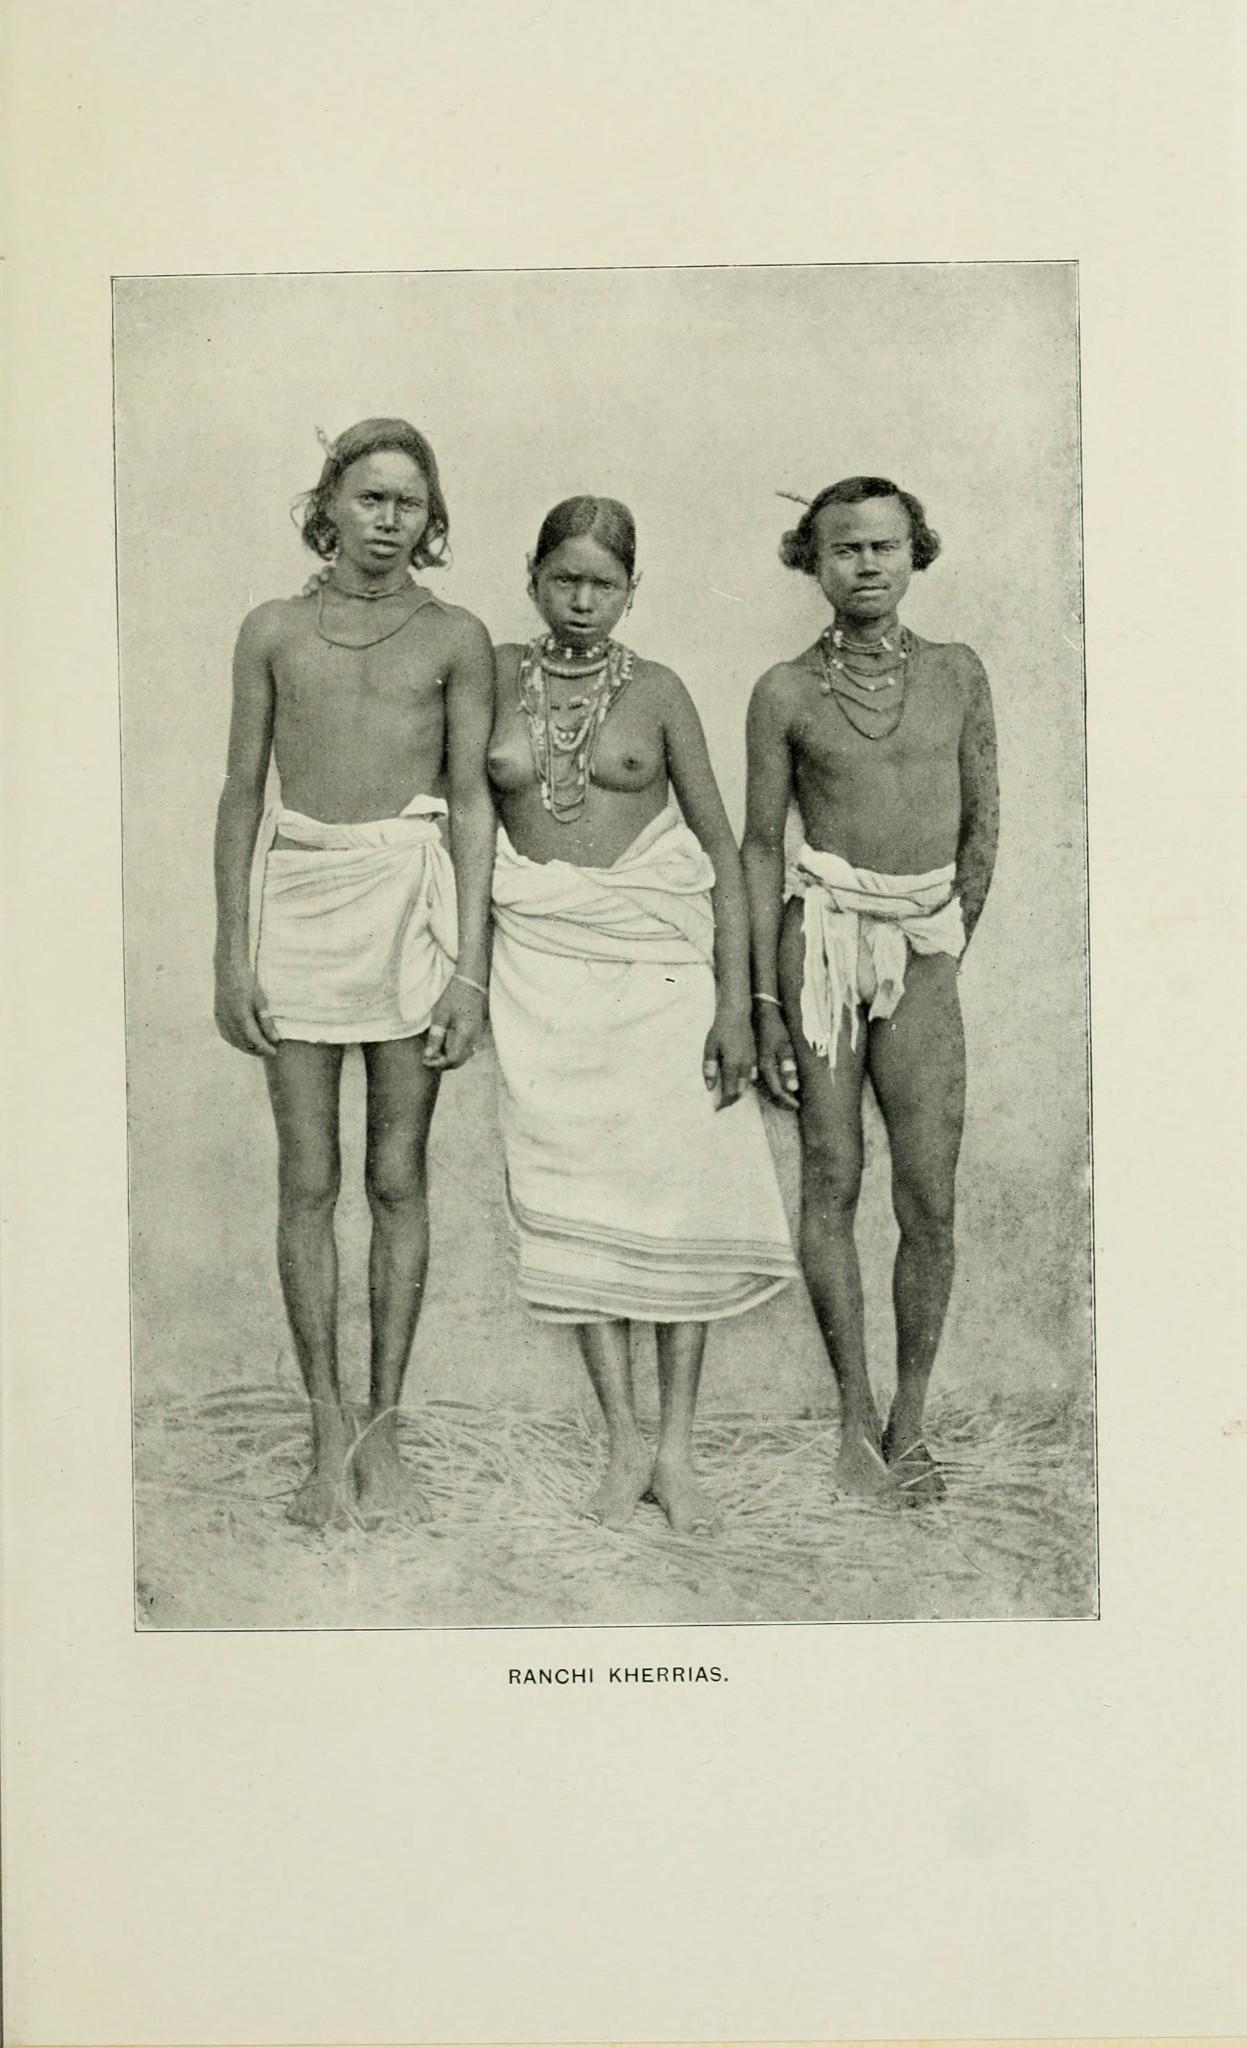 Ranchi Kherrias (Kharia) - Chota Nagpur 1903